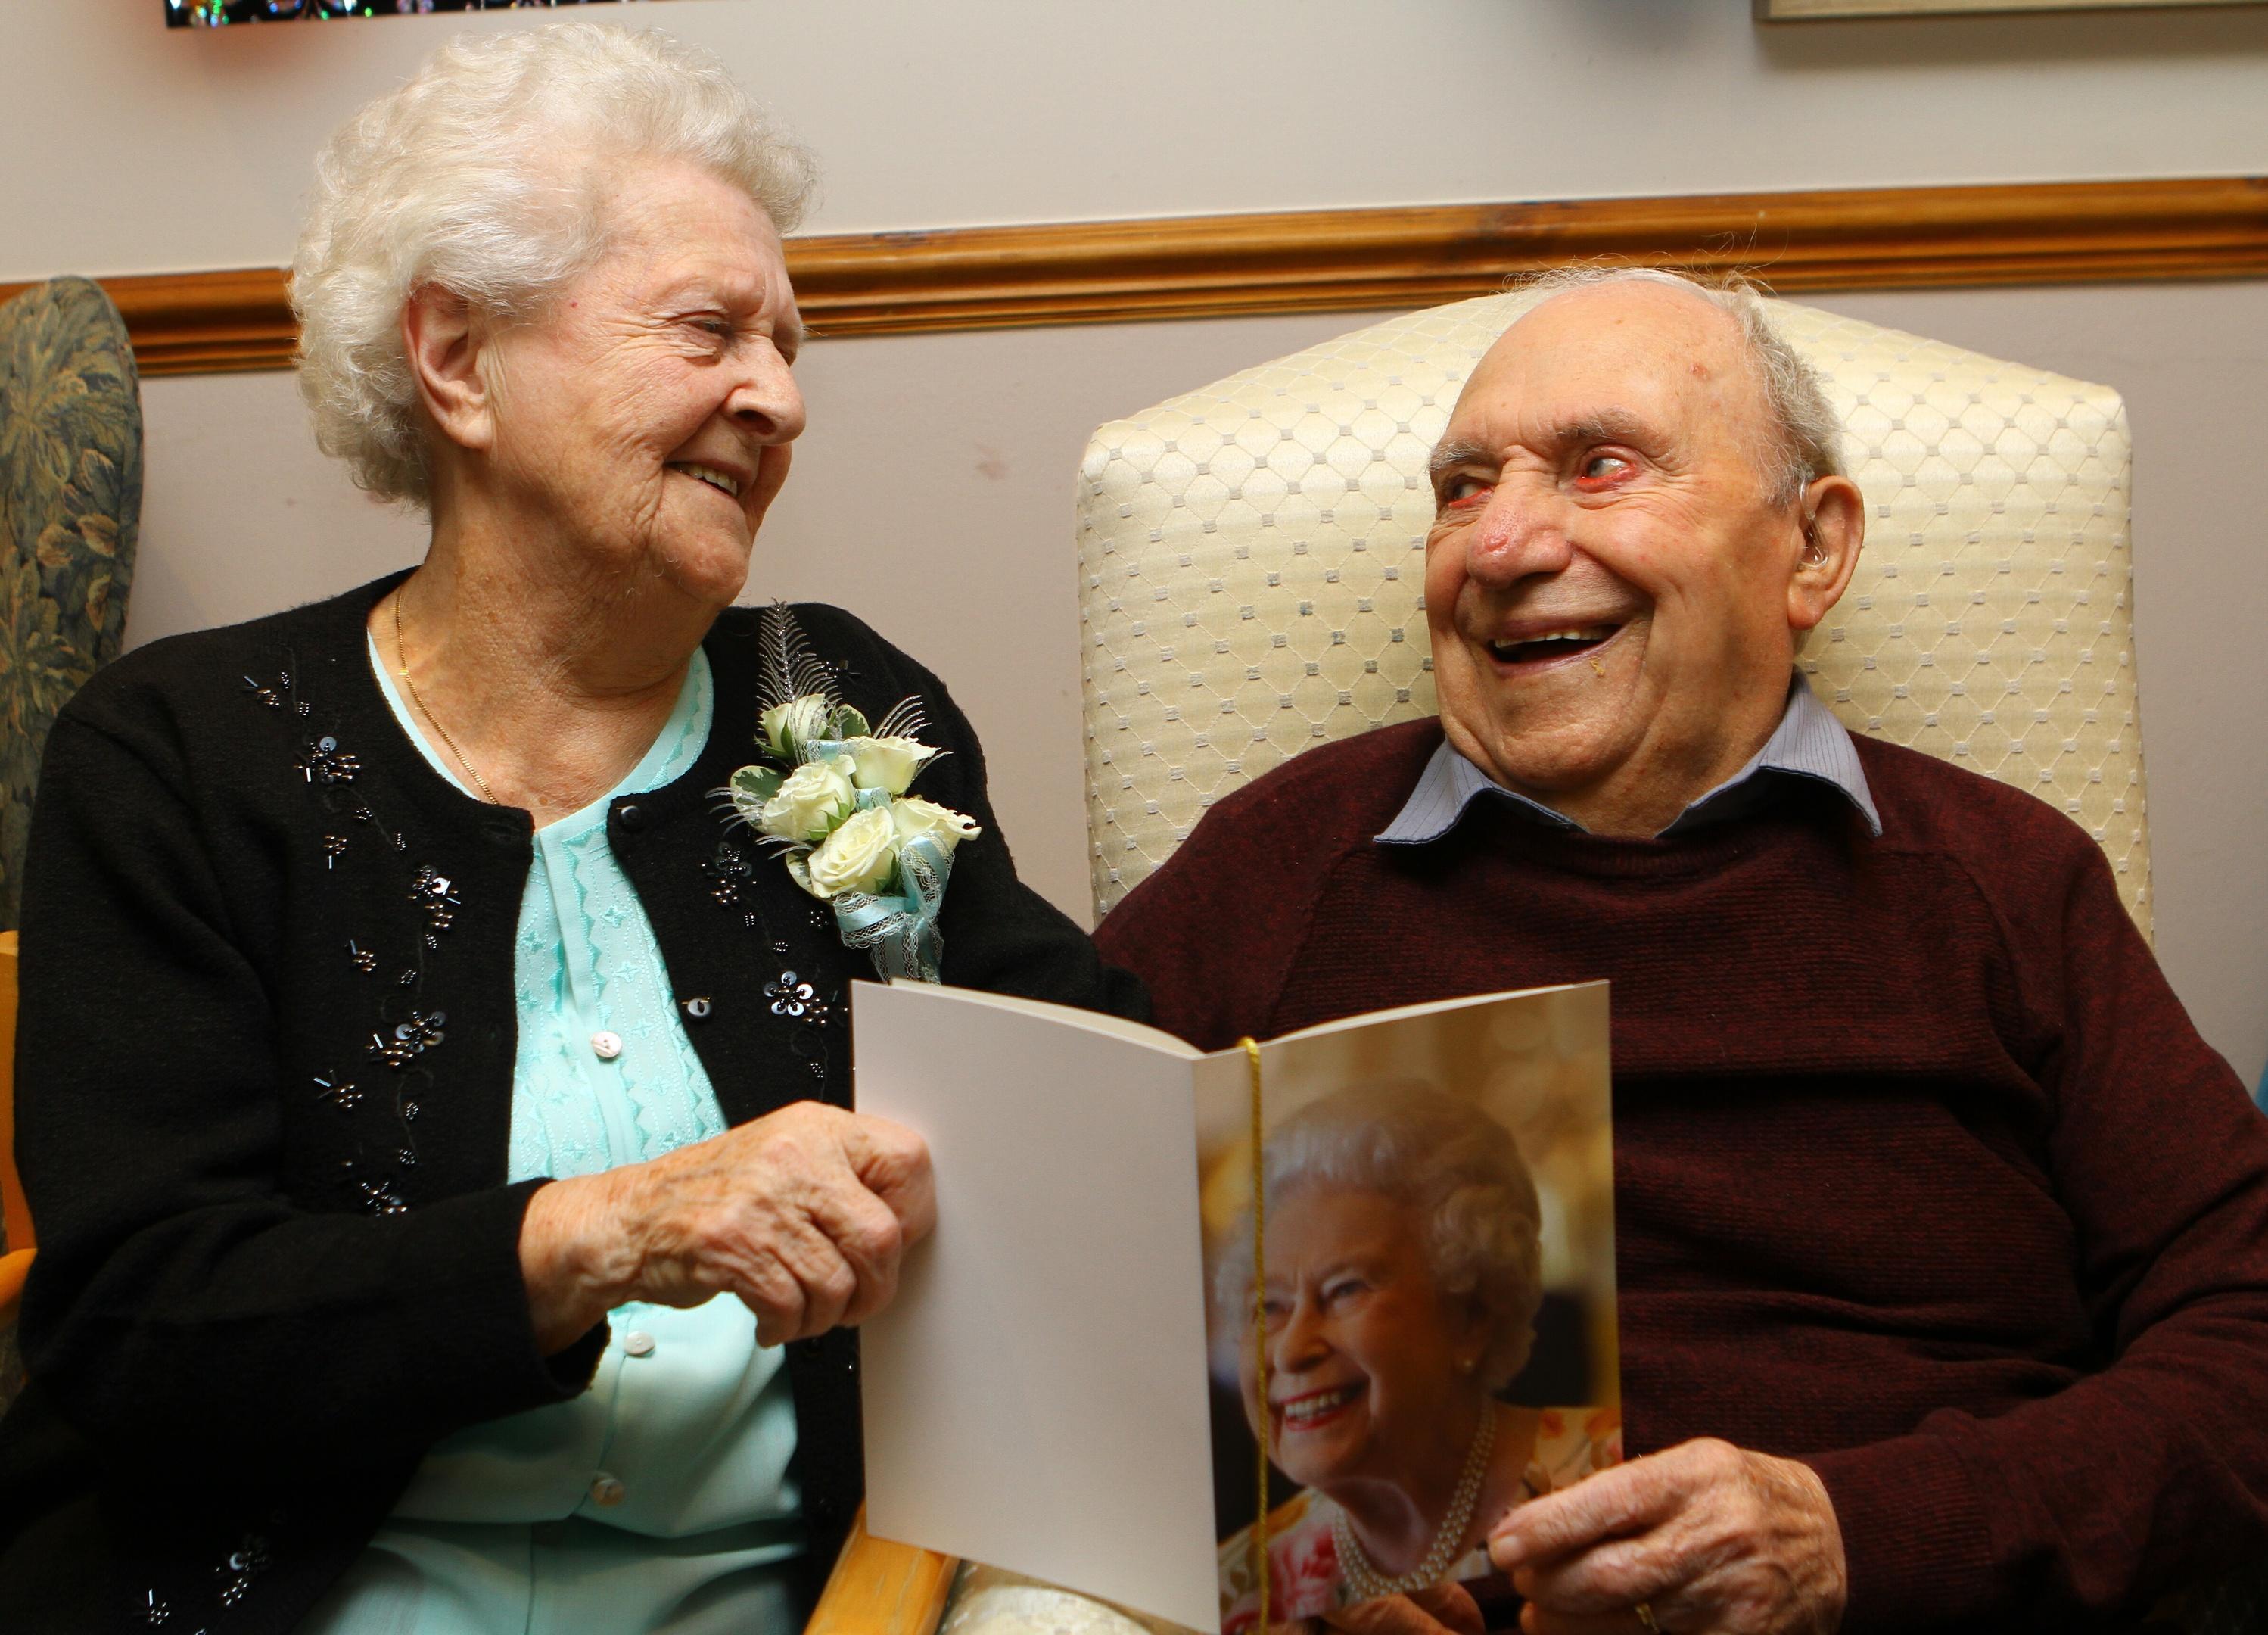 Helen & Neil Scott, celebrating their 70th wedding anniversary